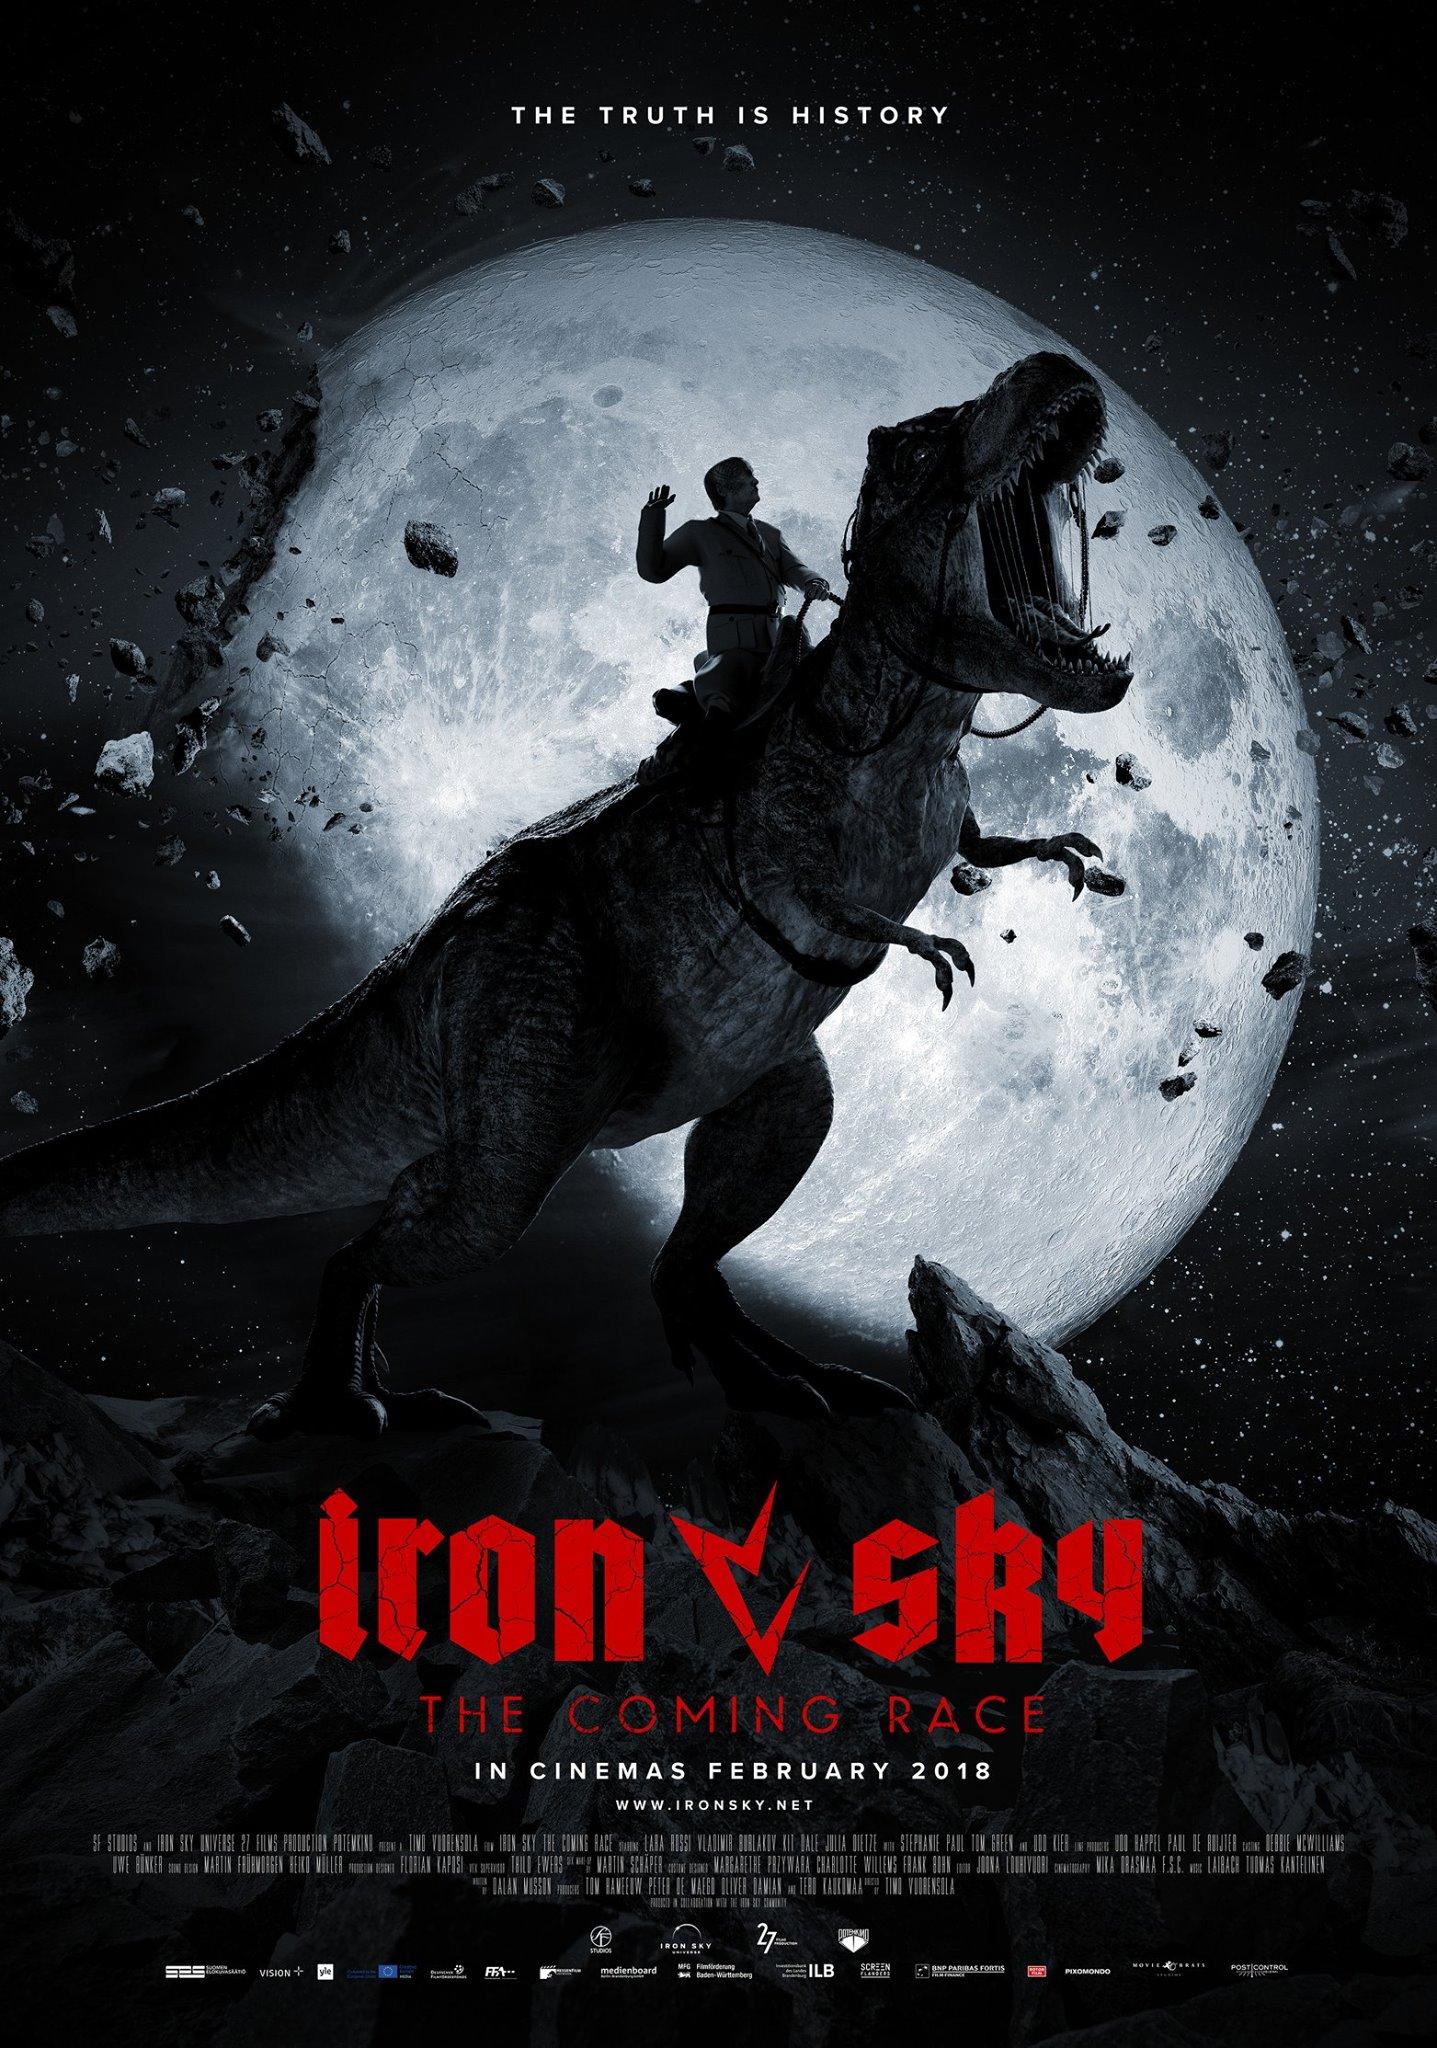 Iron Sky 2 Streamkiste